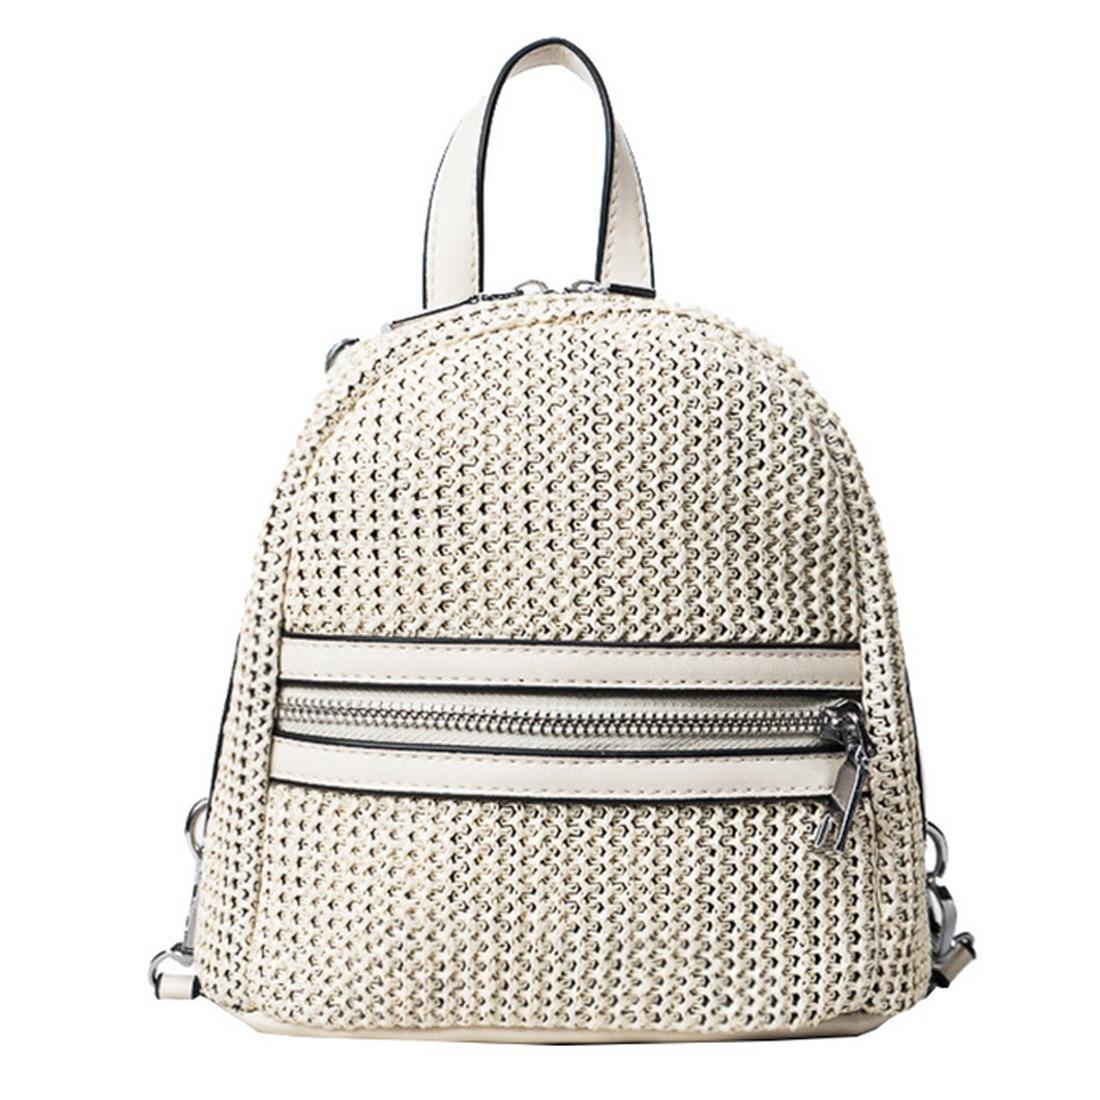 SFG HOUSE Casual Small Backpack Summer Beach Weave Women Bag Fashion Girl School Bag Women Travel